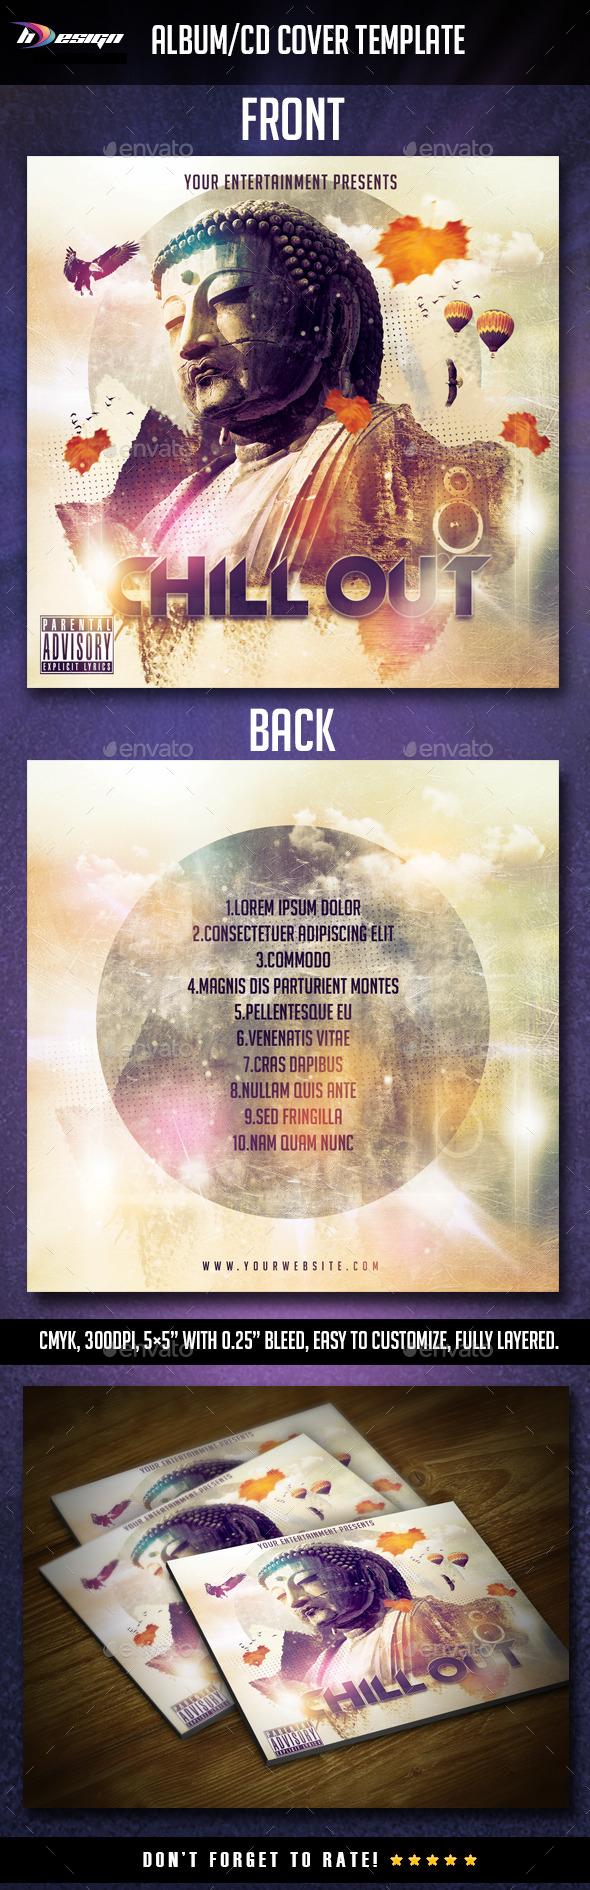 GraphicRiver Chill out album cd cover 10755366